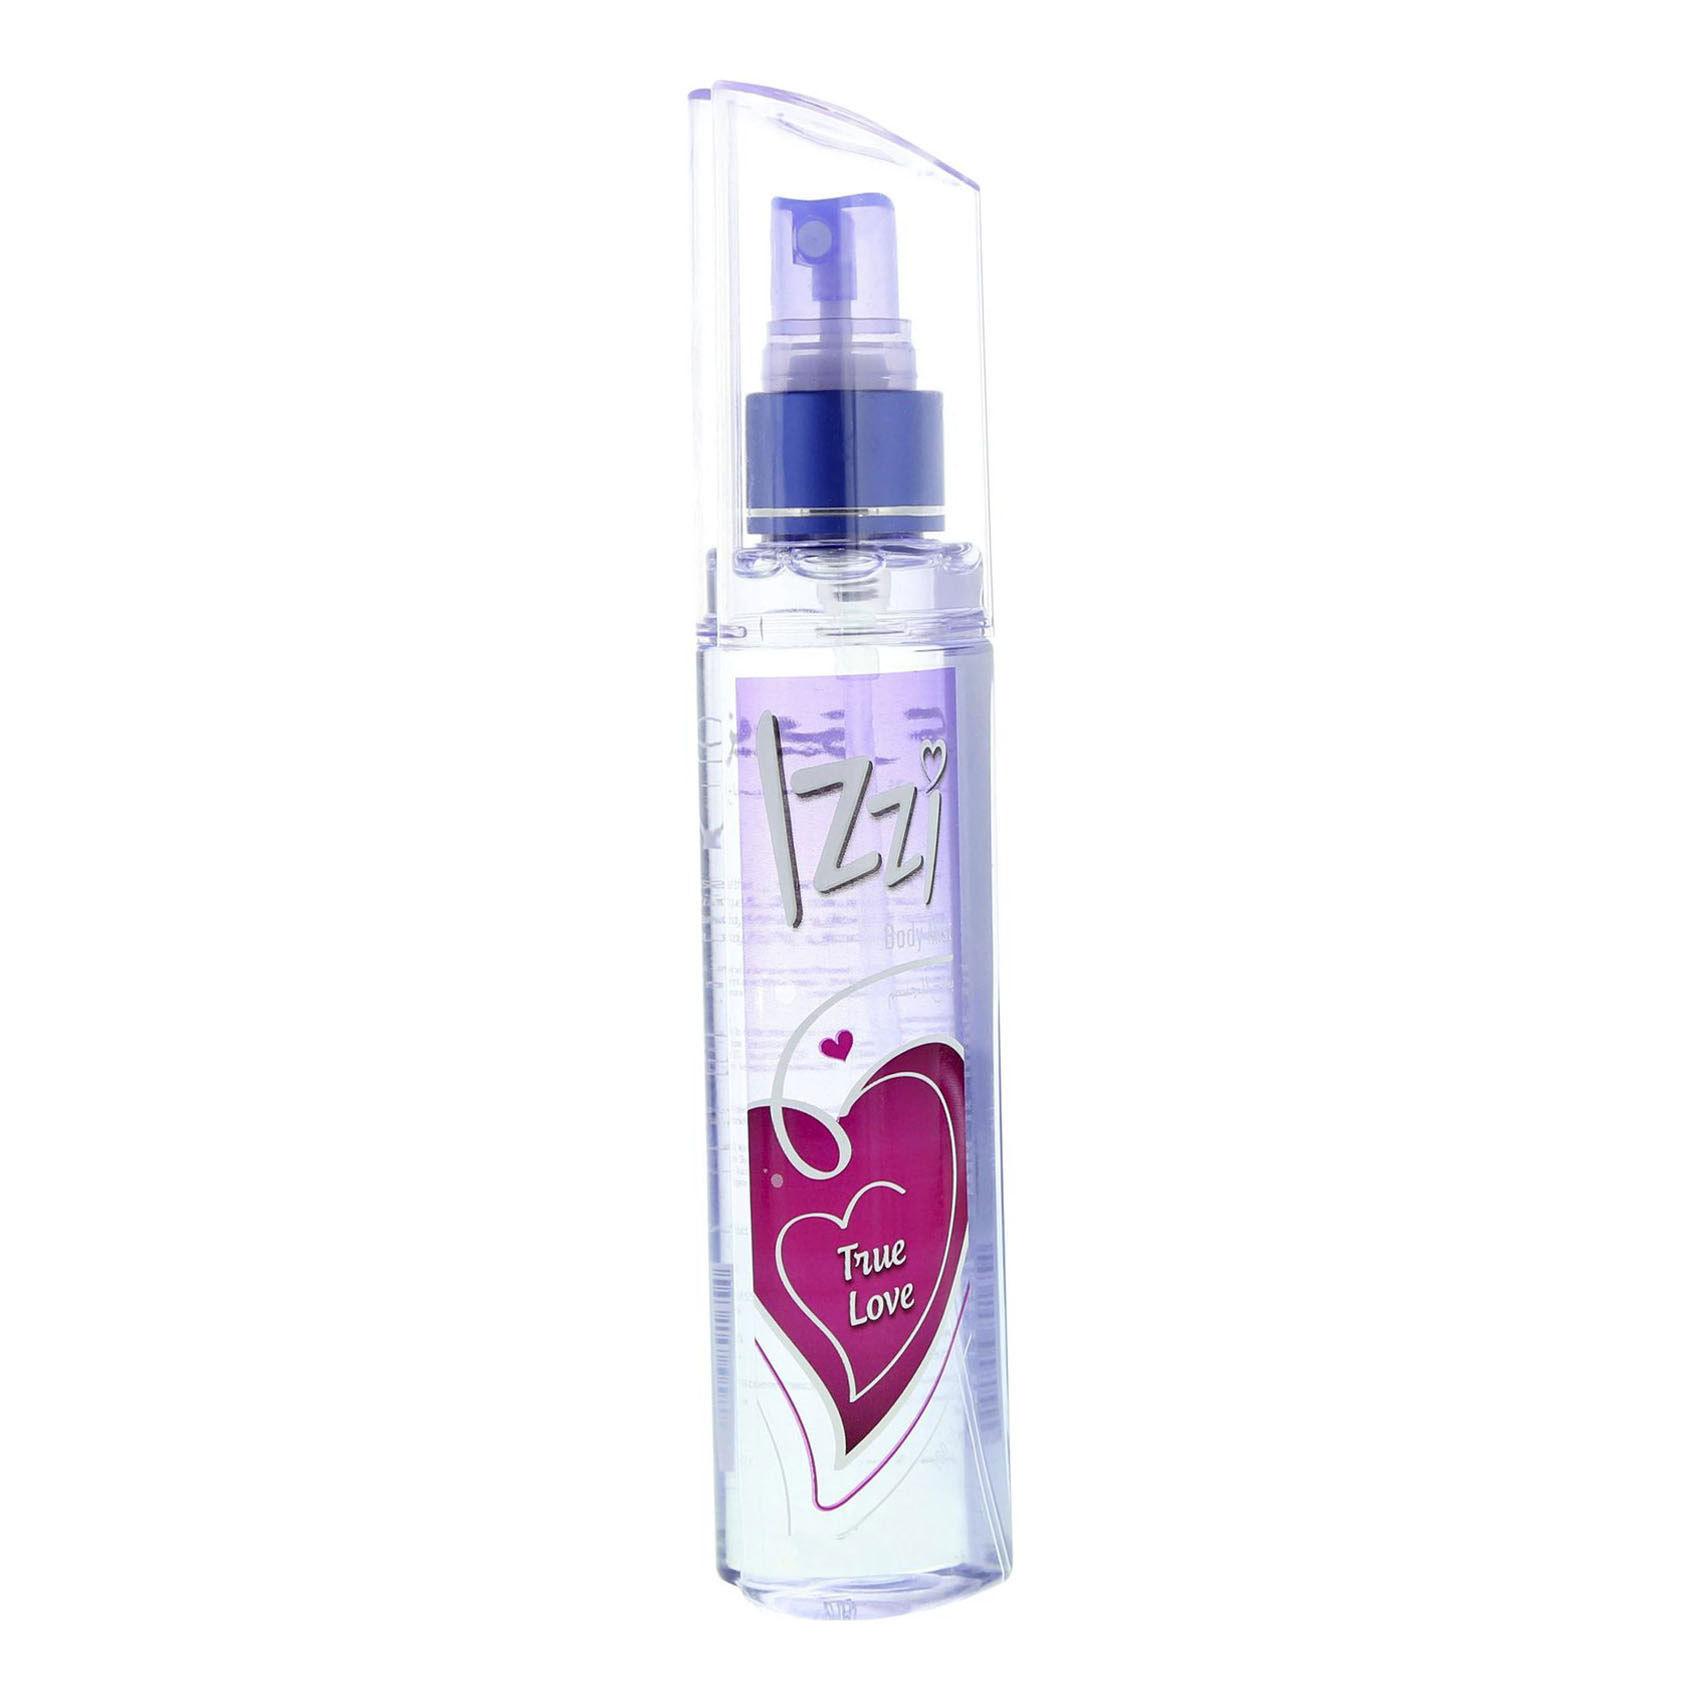 IZZI BODY MIST TRUE LOVE 100ML